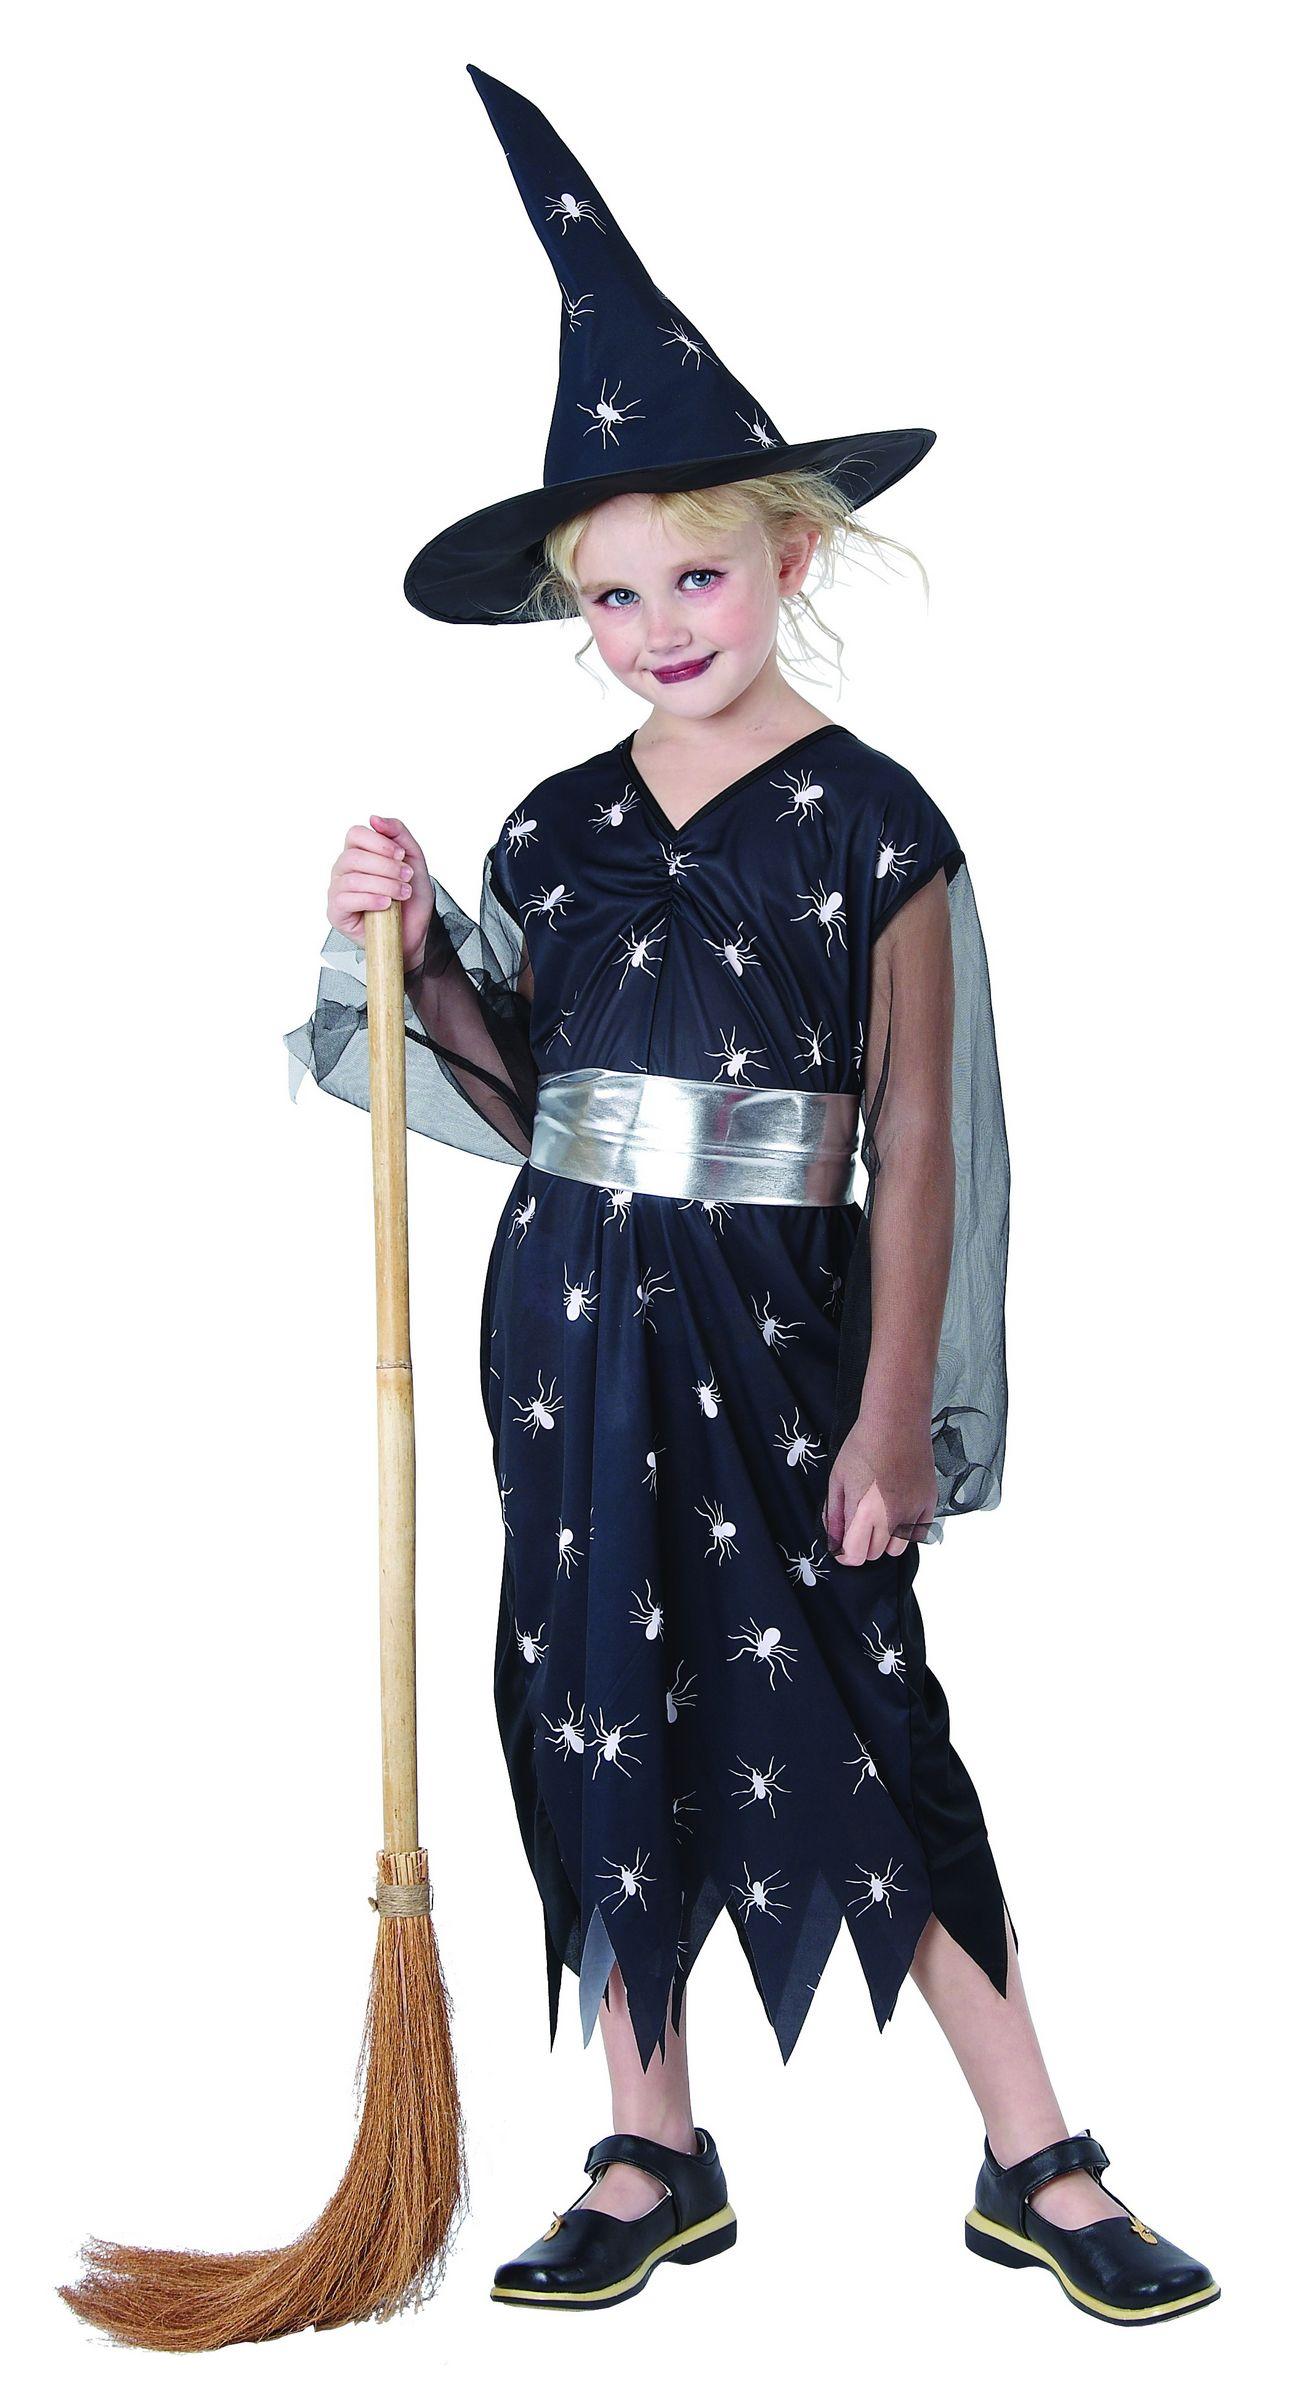 Disfraz De Bruja Para Nina Azul Cosmico Disfraces Ninosy Disfraces - Disfraz-de-bruja-para-bebe